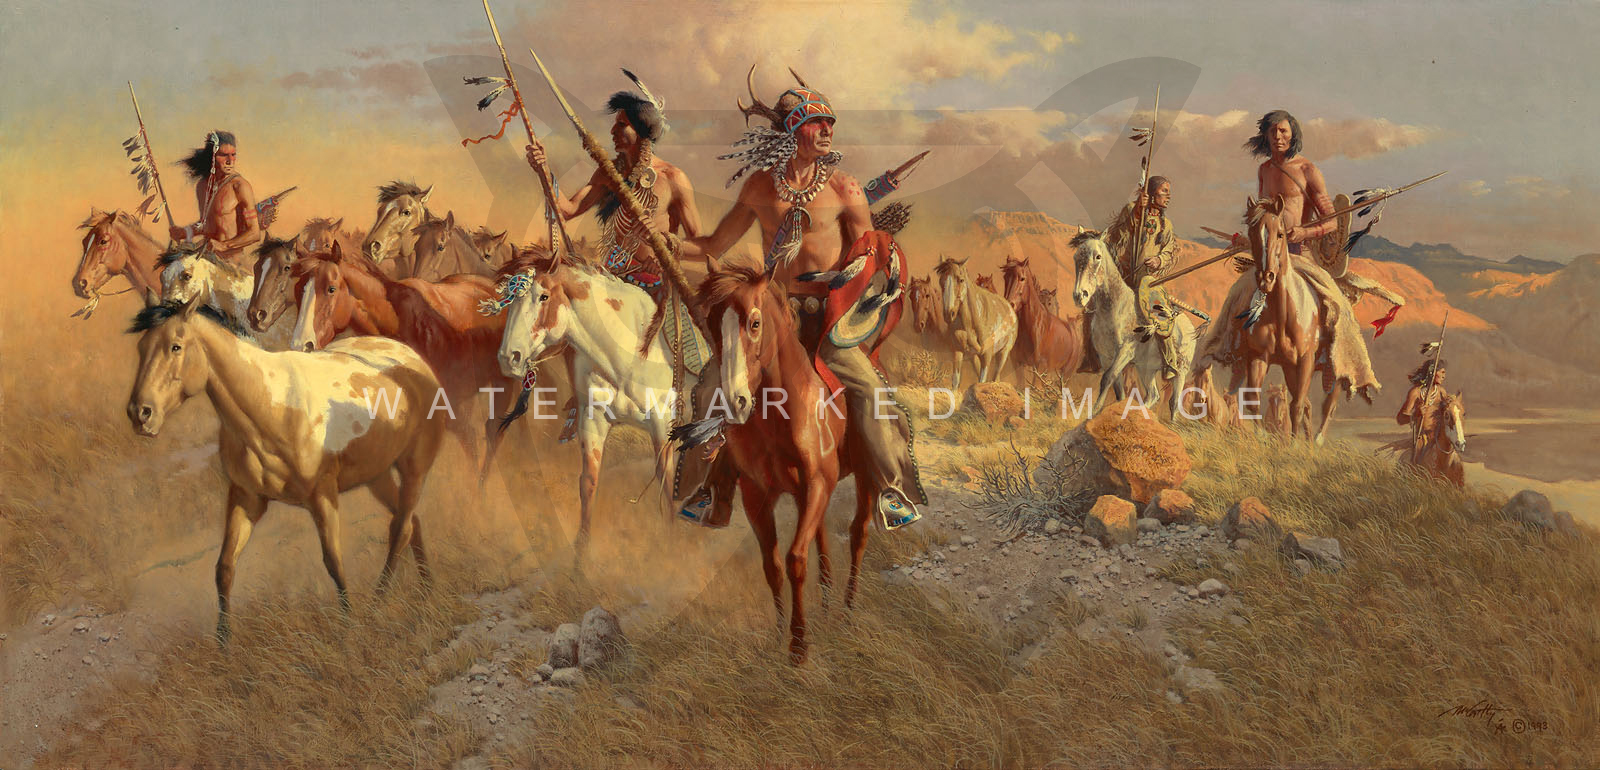 Native American Indian Art 1600x770